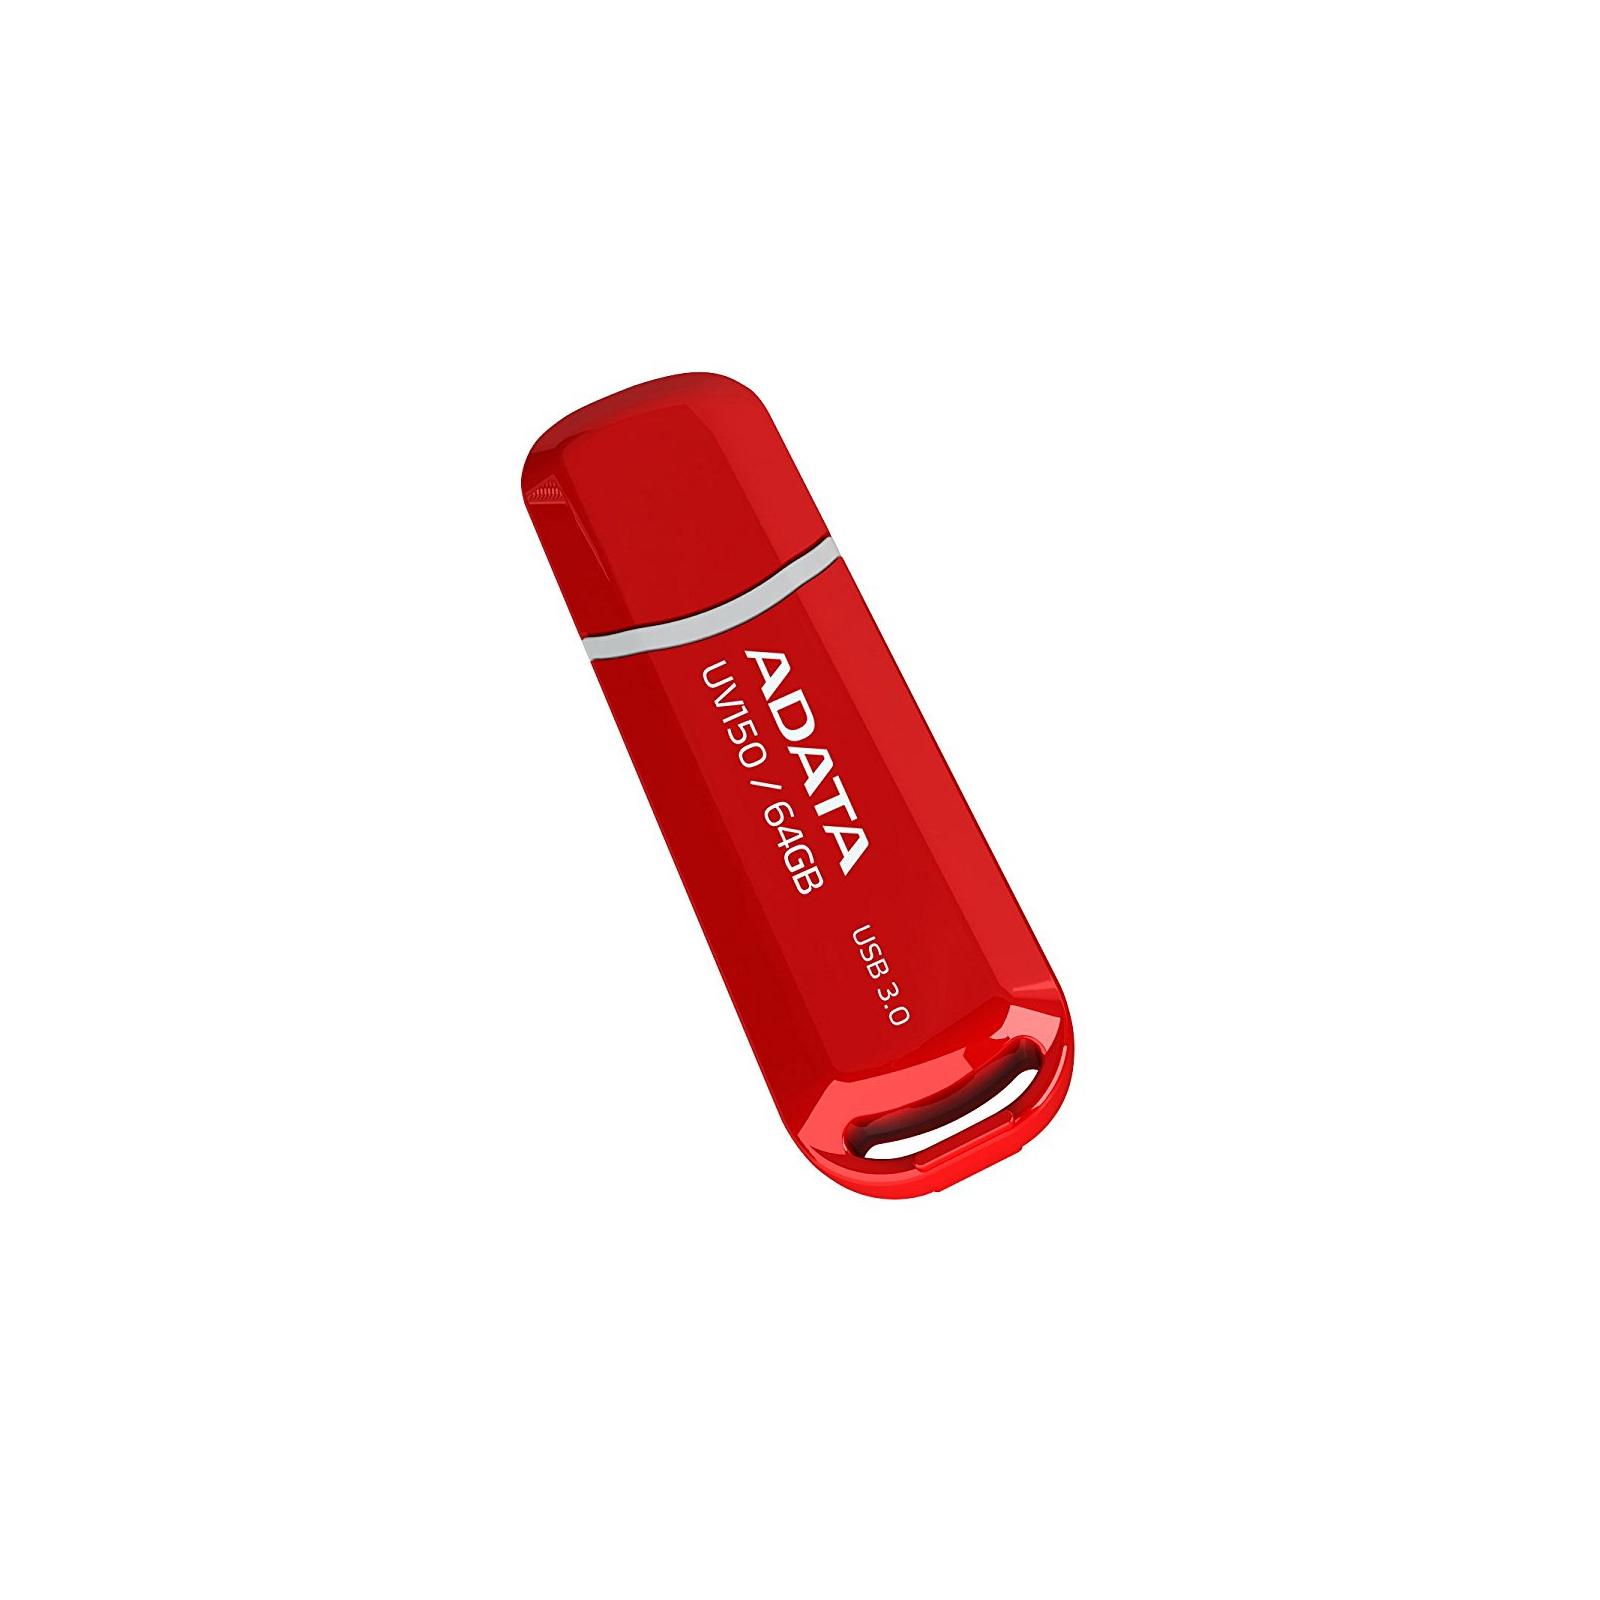 USB флеш накопитель ADATA 64GB UV150 Black USB 3.0 (AUV150-64G-RBK) изображение 2